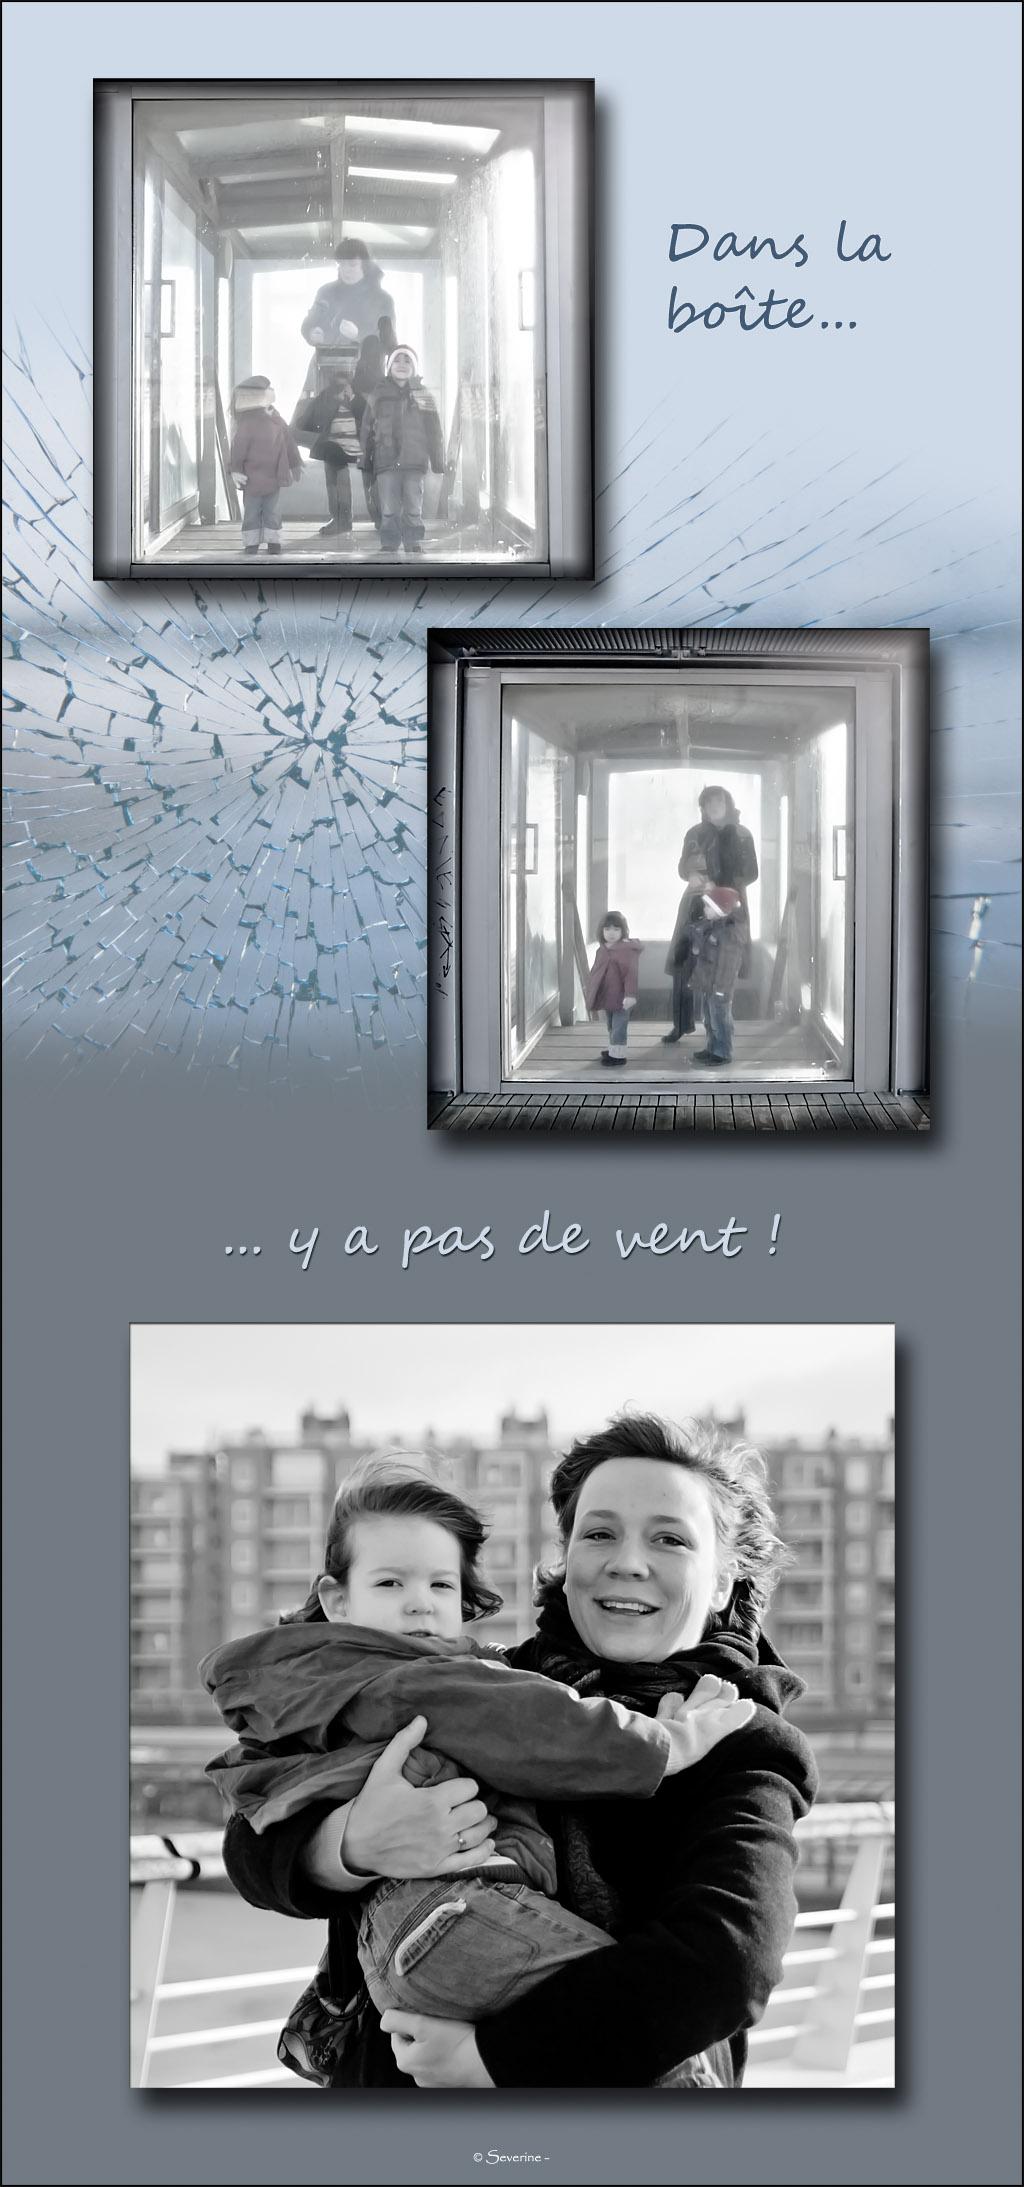 http://fredetsev.eu/imagespourblog/enfants_cube_plagehollande.jpg